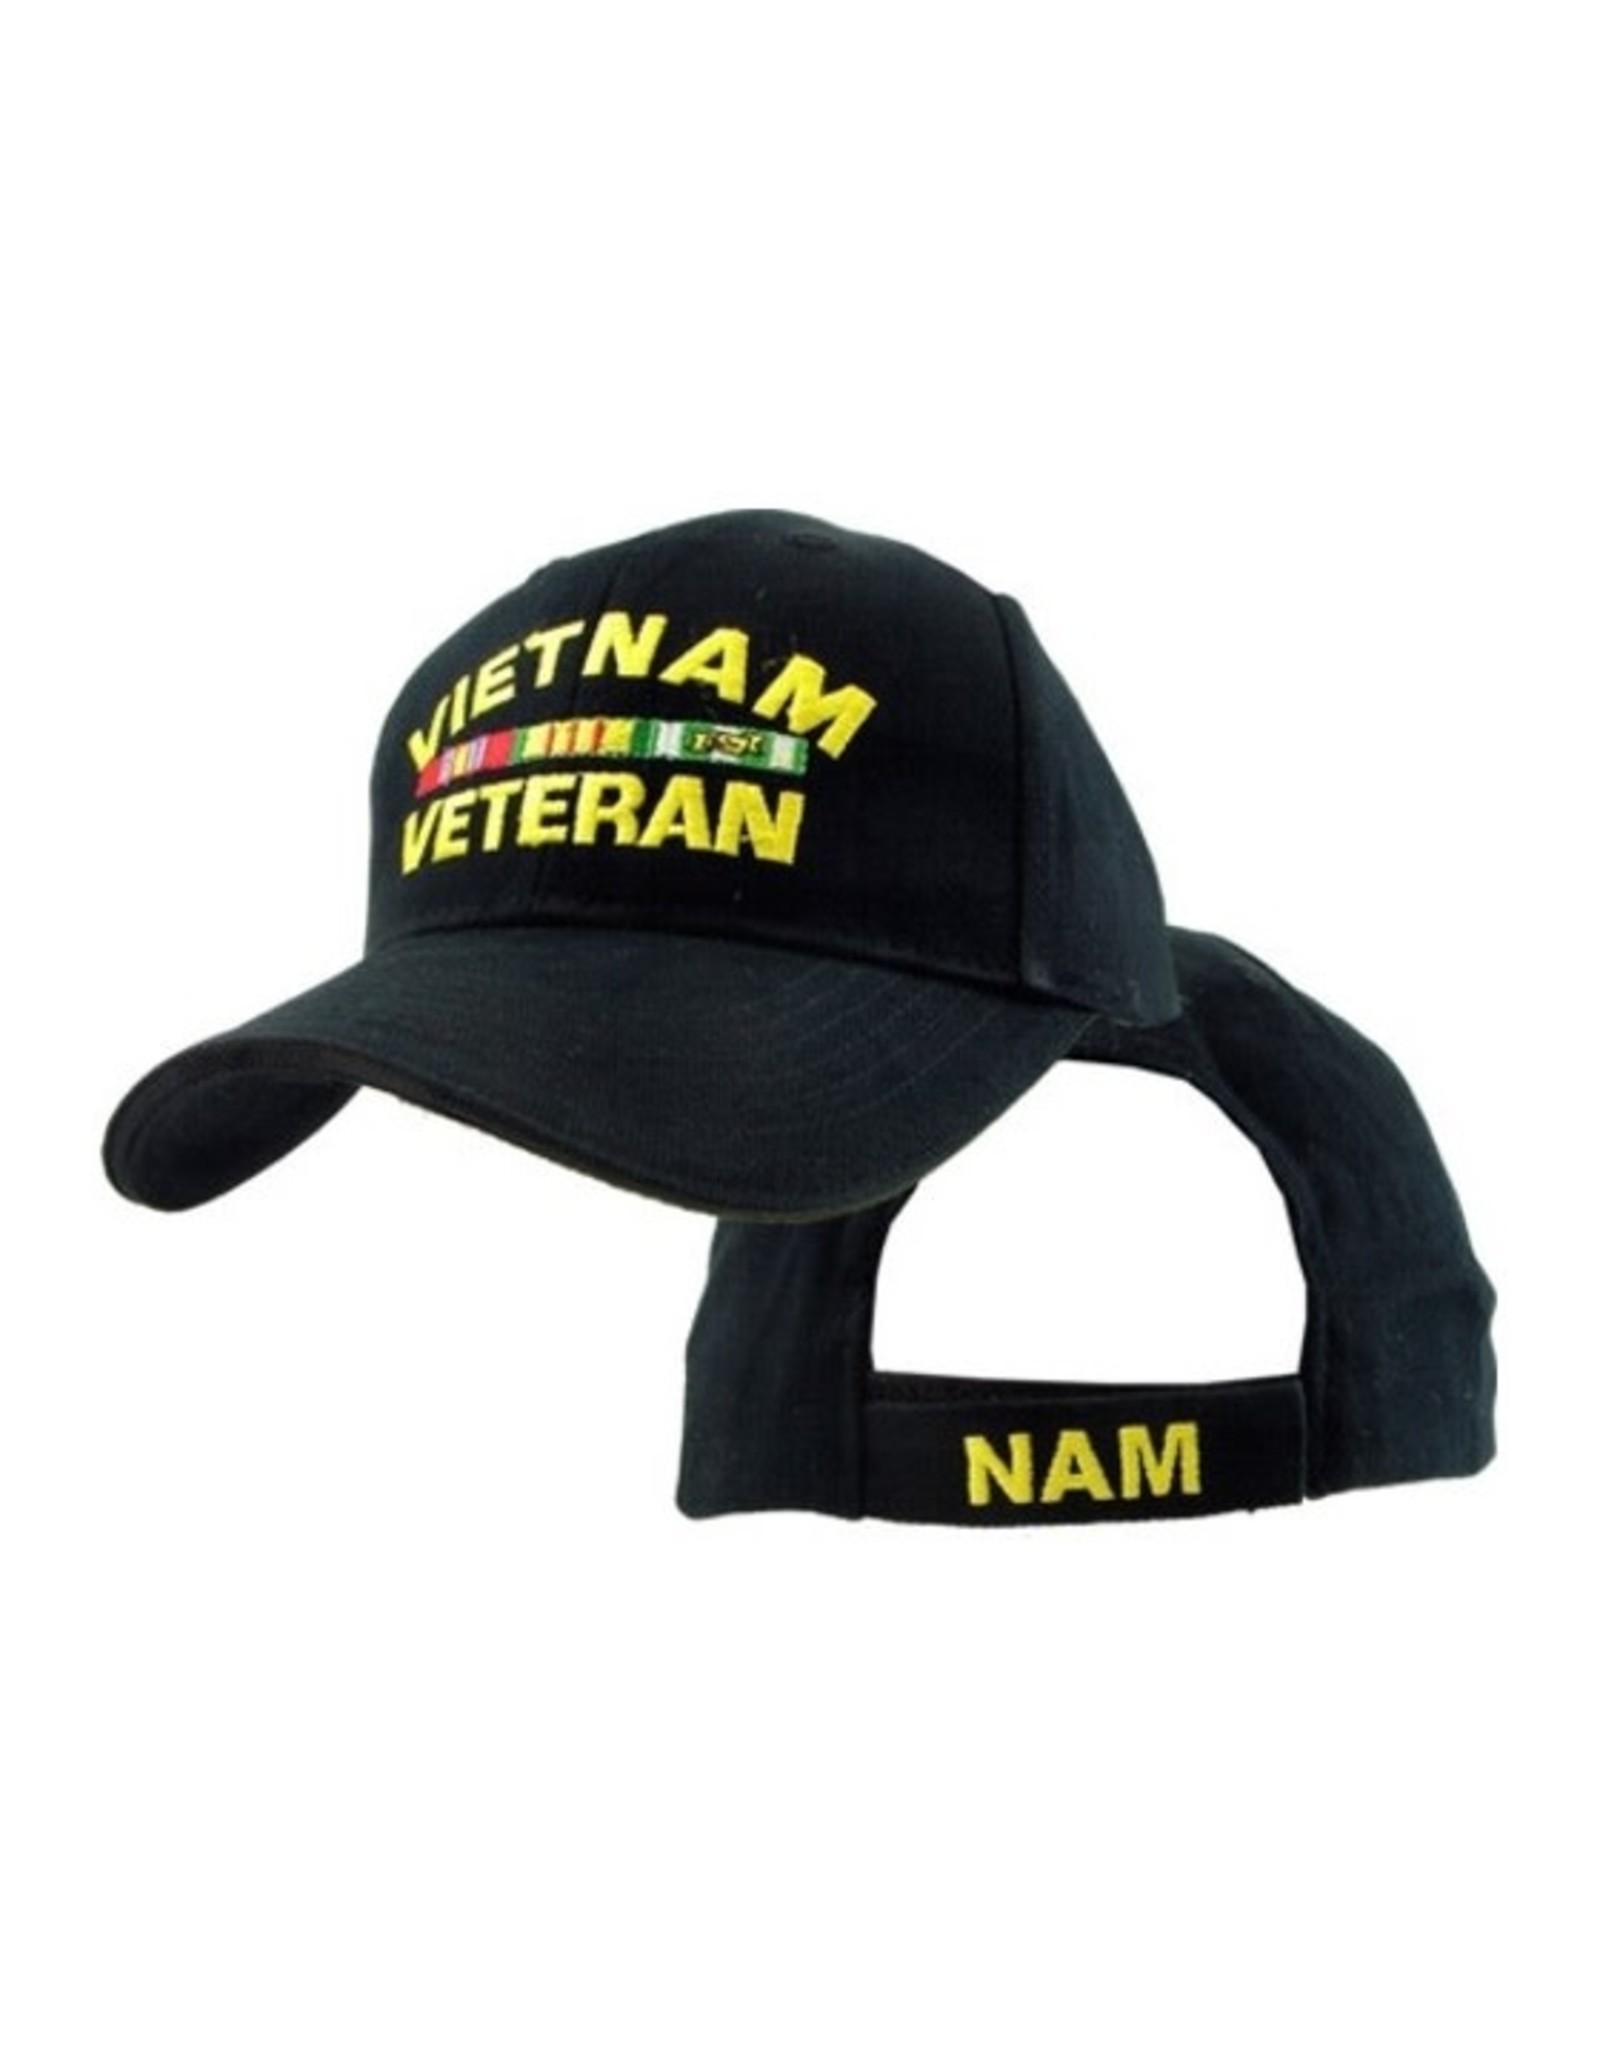 MidMil Vietnam Veteran Hat with Ribbons Black